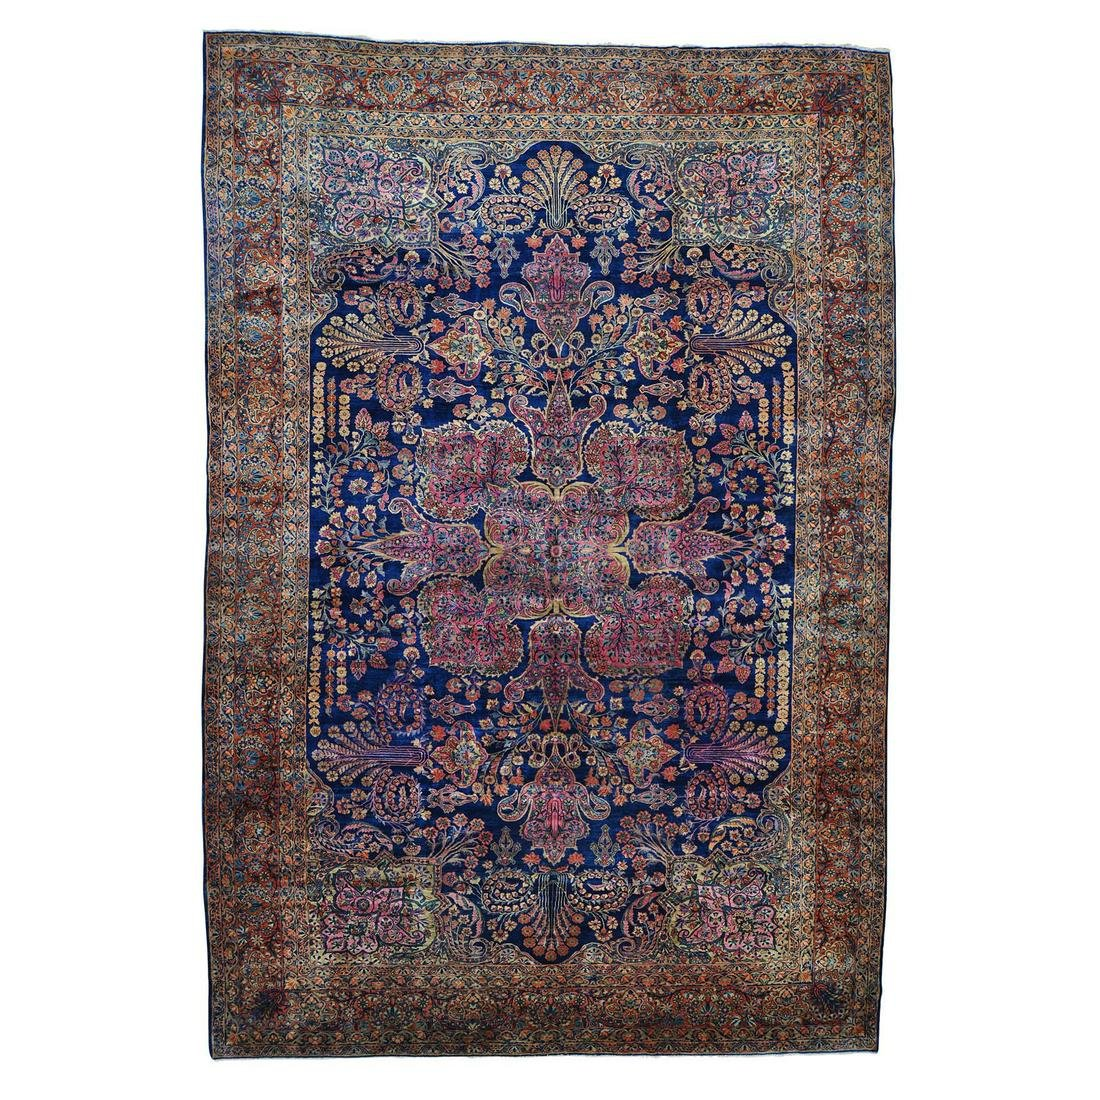 Antique Persian Mohajeran Sarouk Oversize Rug